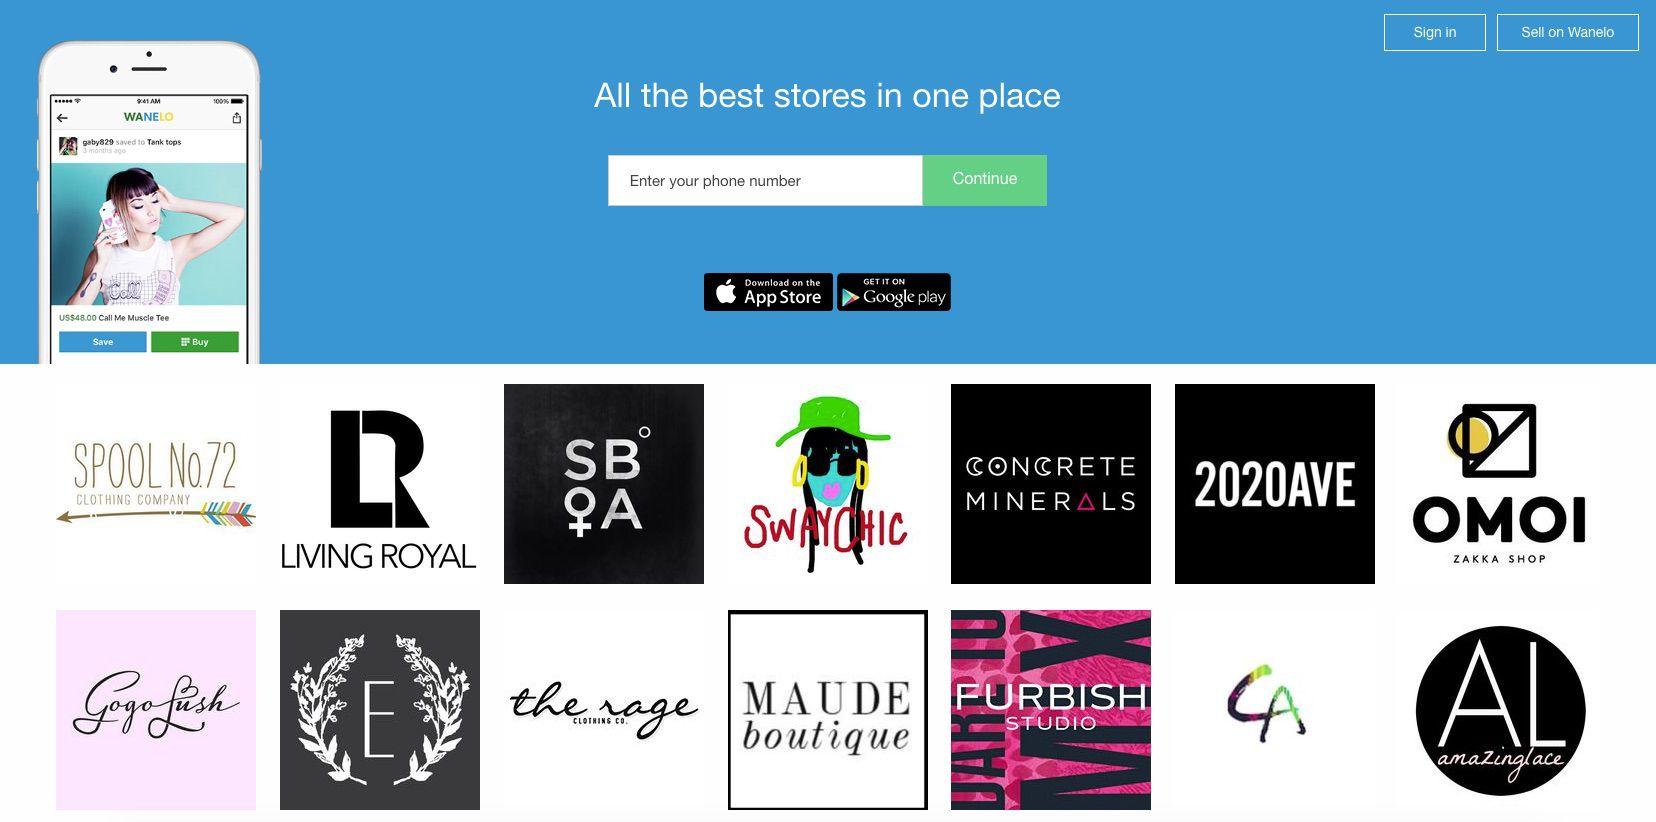 A screenshot of the Wanelo website.